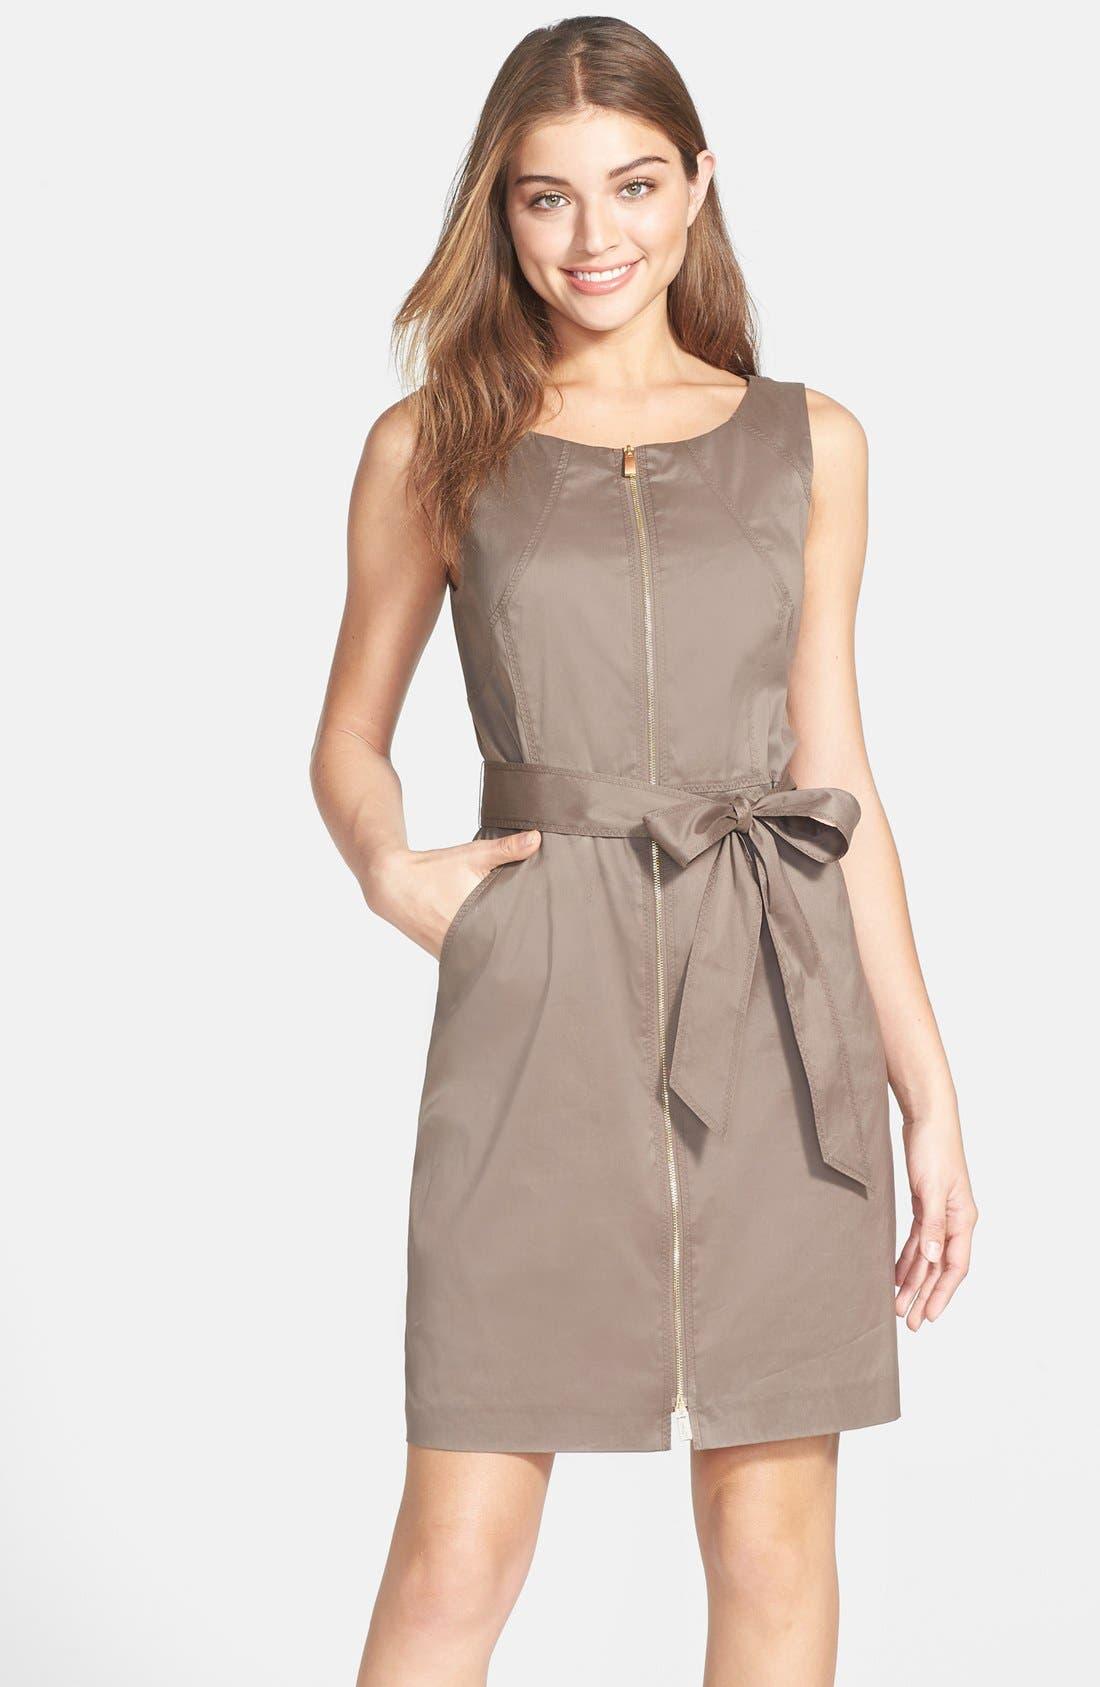 Alternate Image 1 Selected - Vince Camuto Zip Front Cotton Blend Sheath Dress